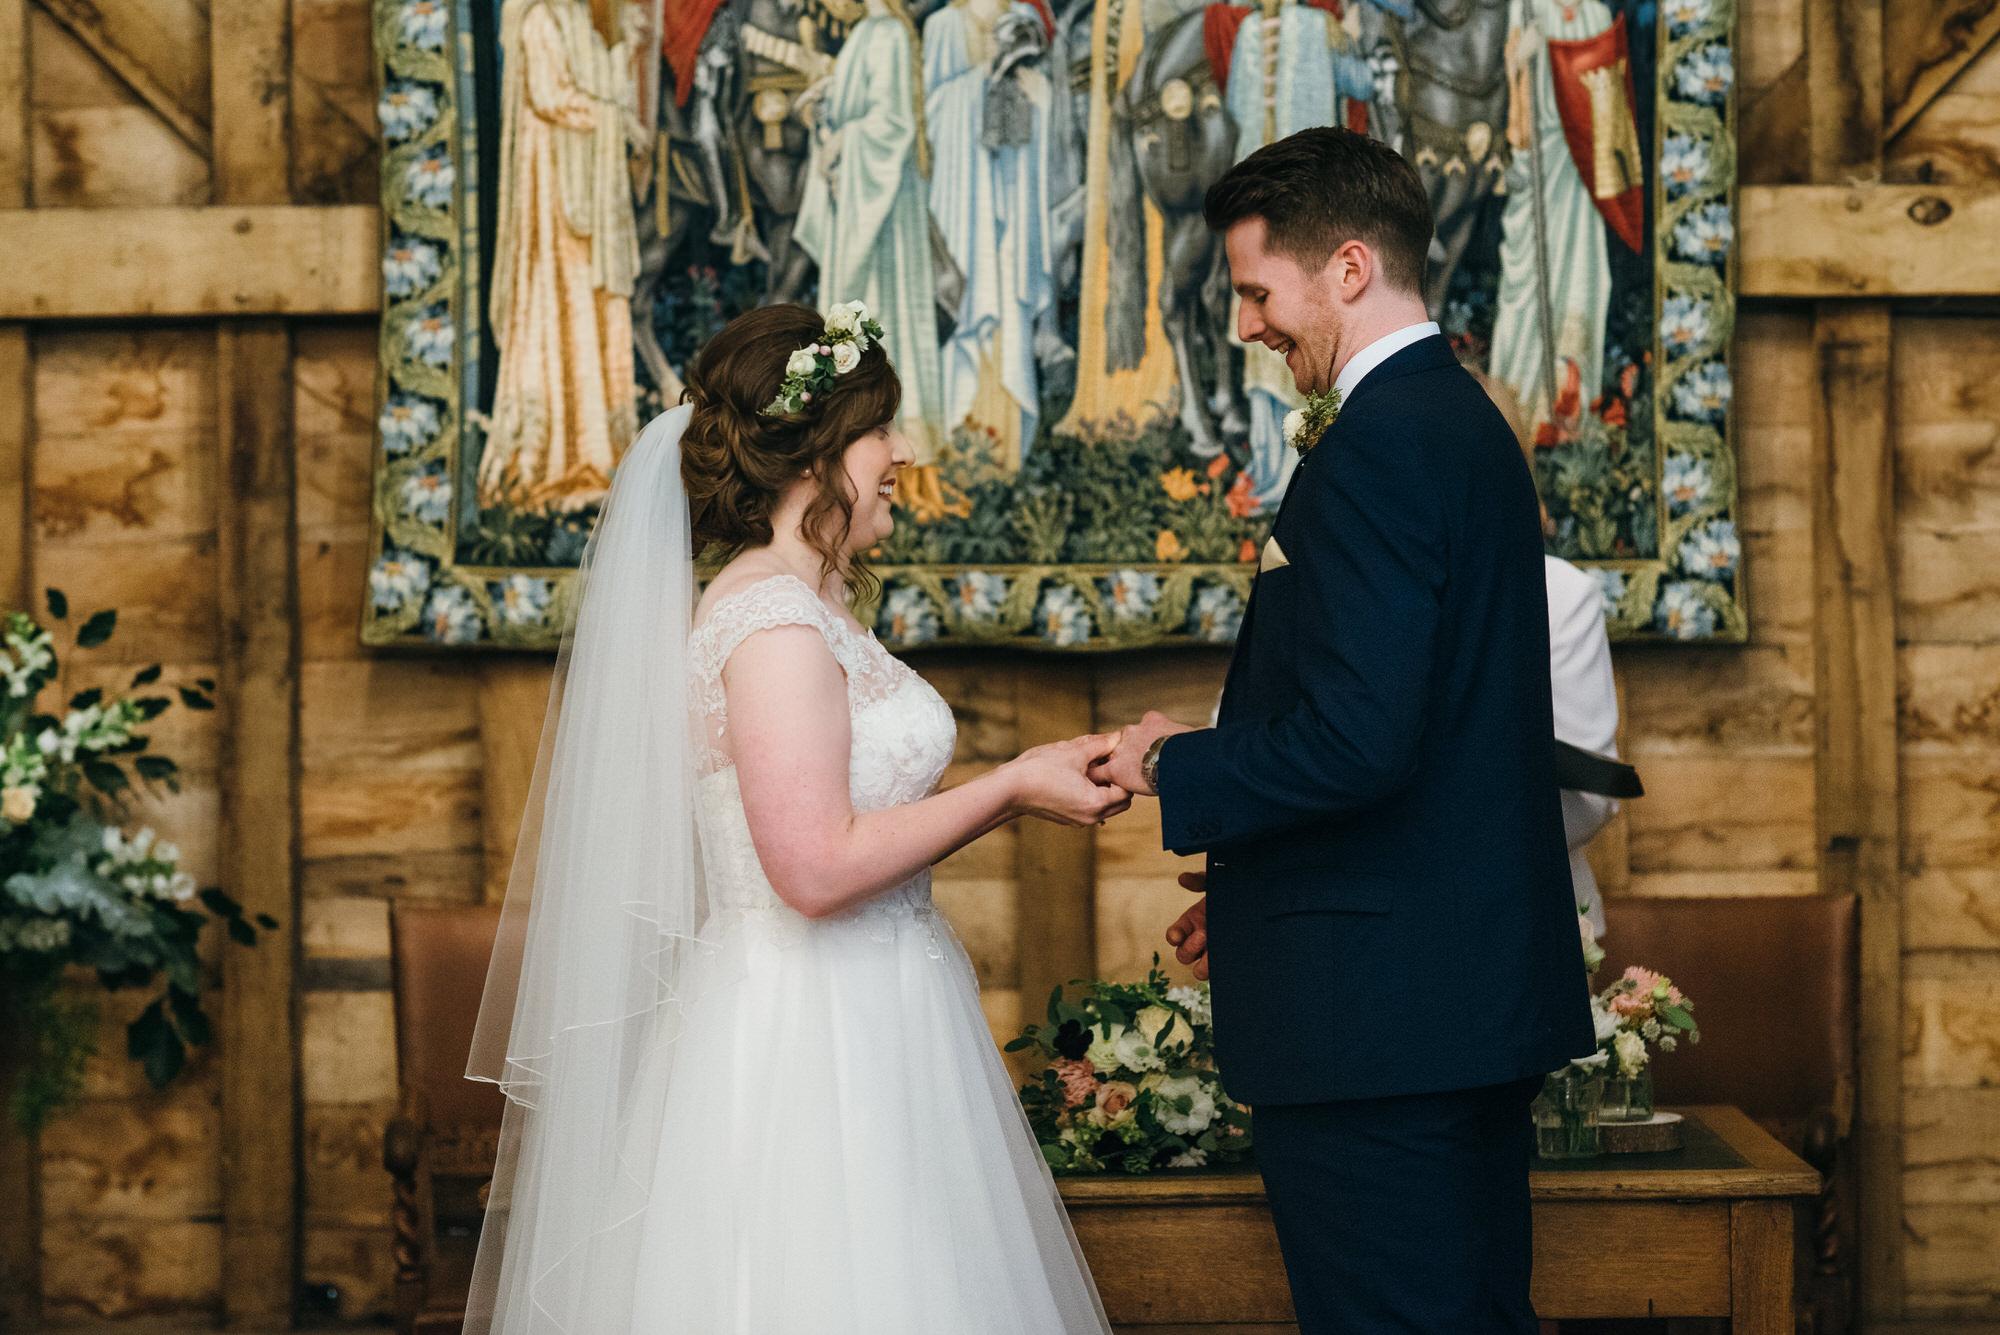 Colville hall barn wedding ceremony